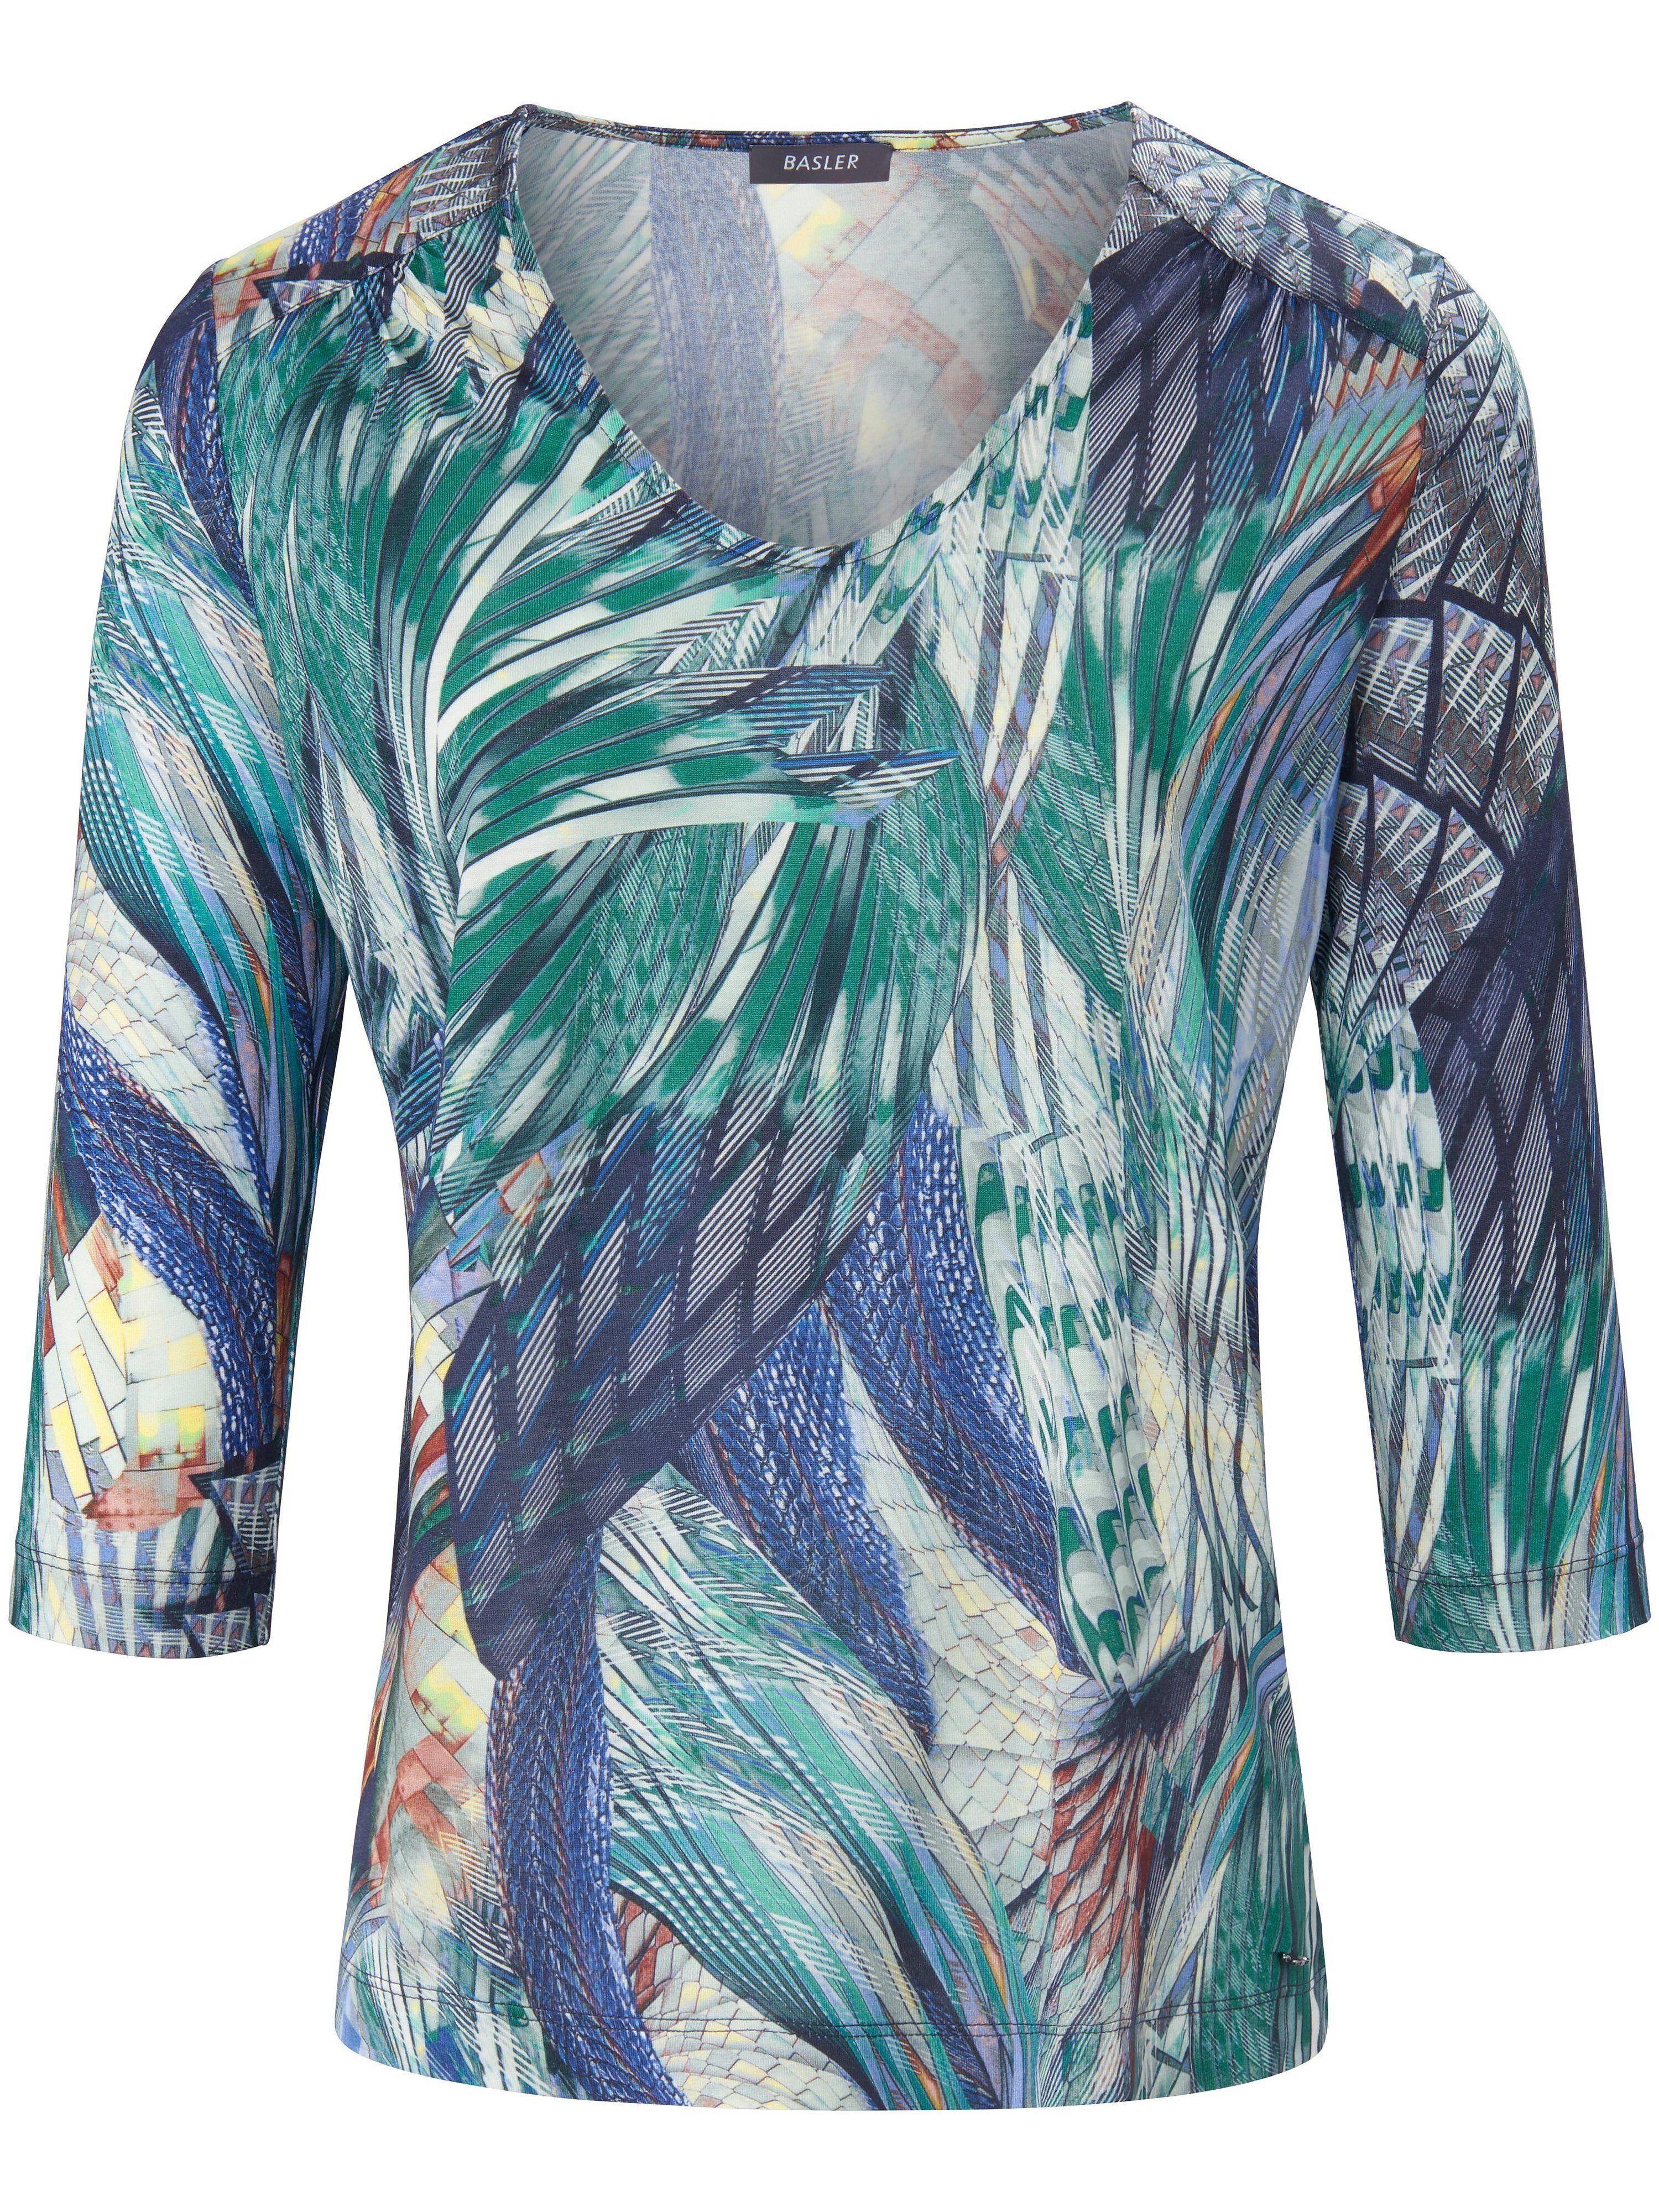 Basler Le T-shirt manches 3/4  Basler multicolore  - Femme - 48